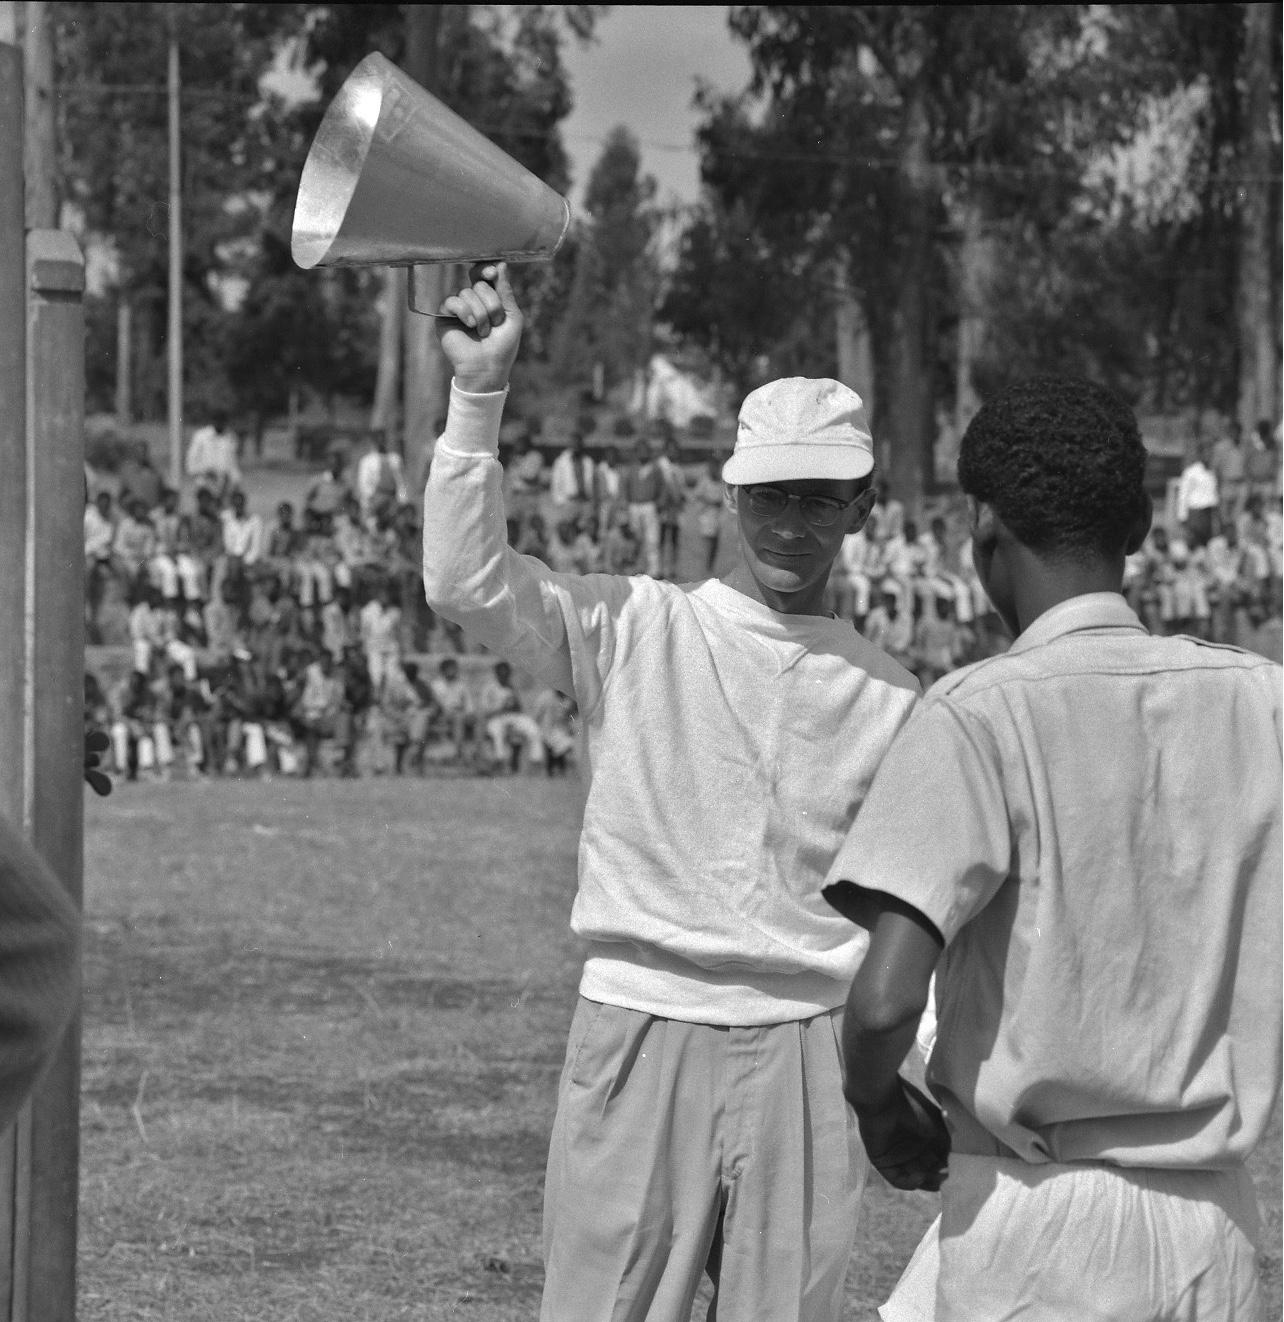 TMS-Student-Sports-circa-1964_6